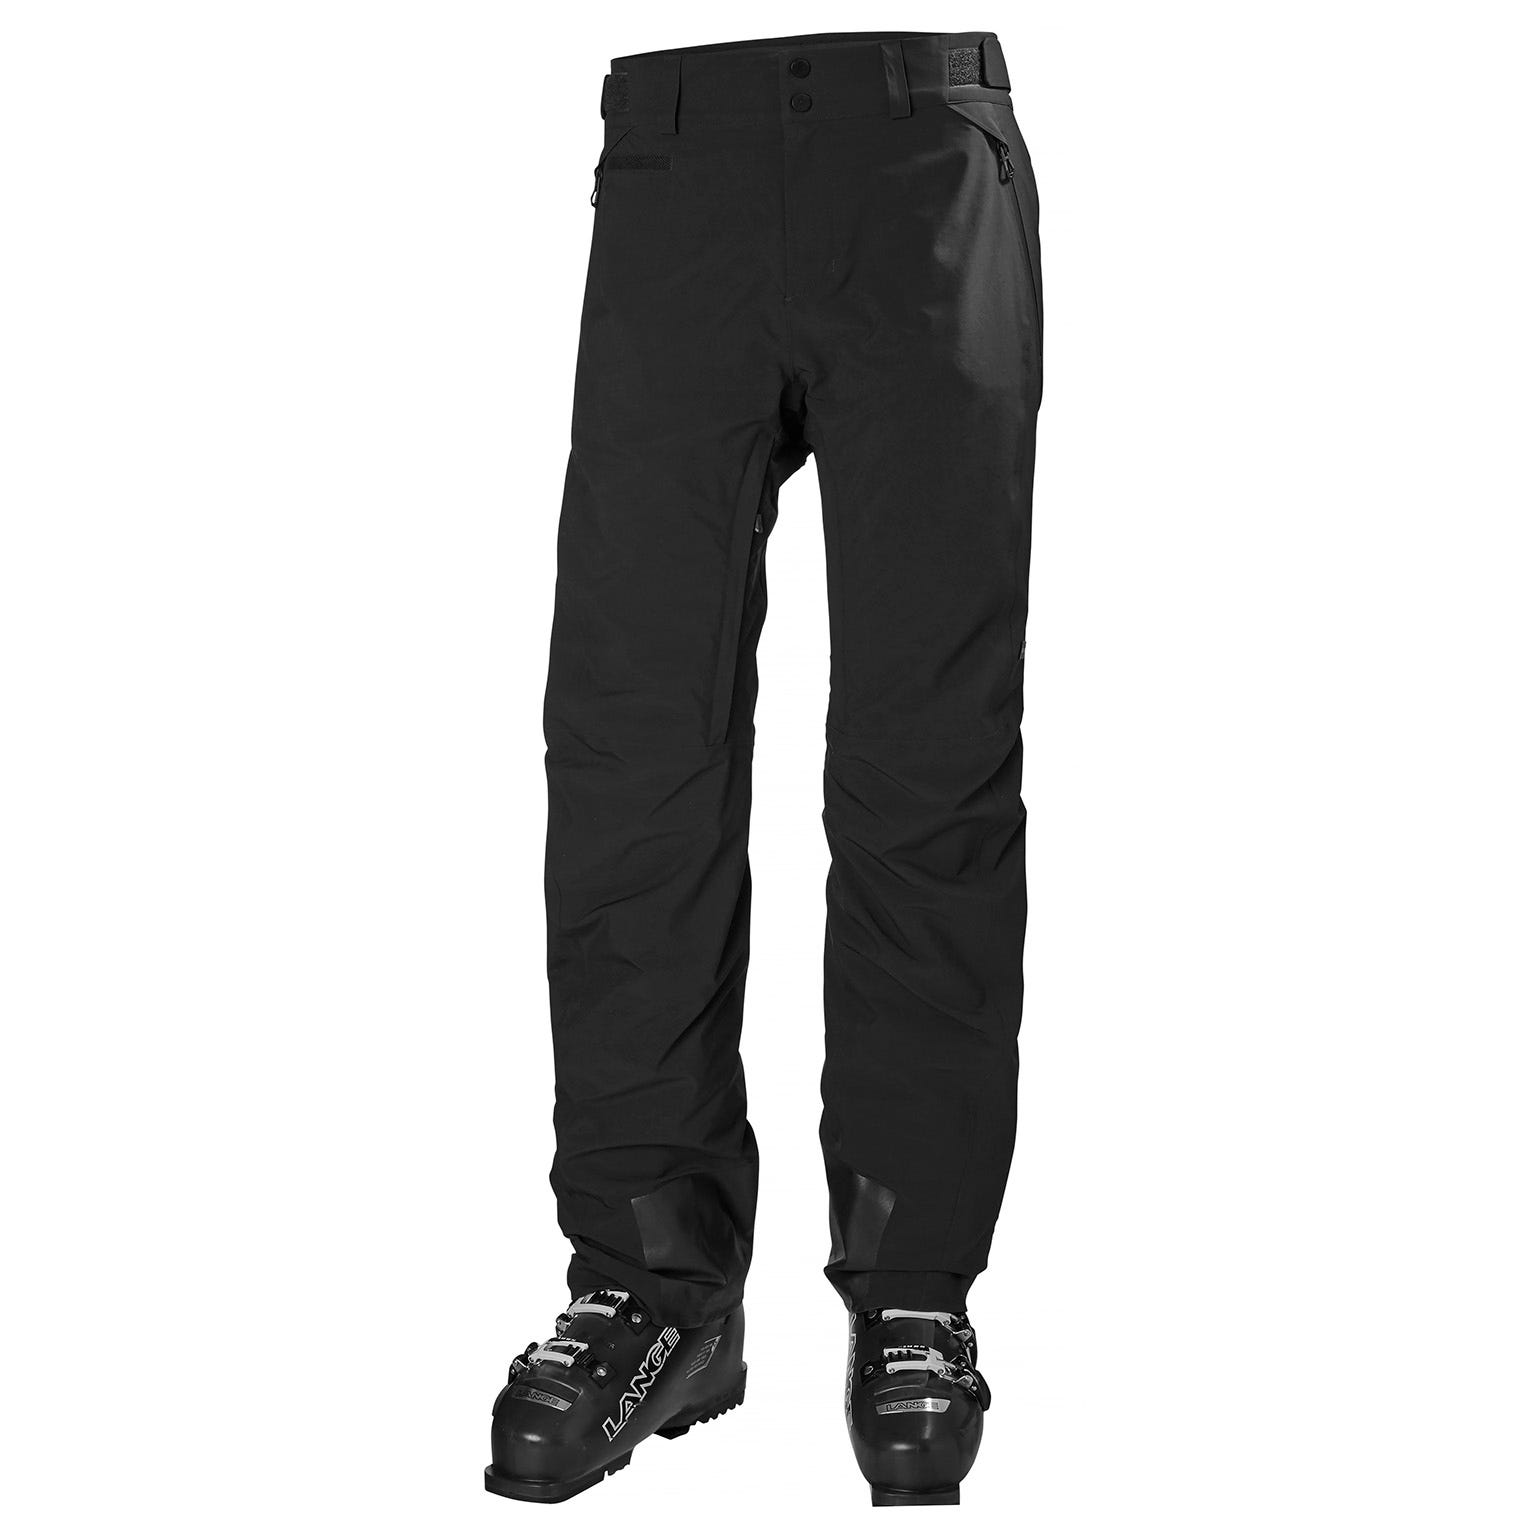 Helly Hansen Mens Jackson Insulated Ski Trouser Black XL